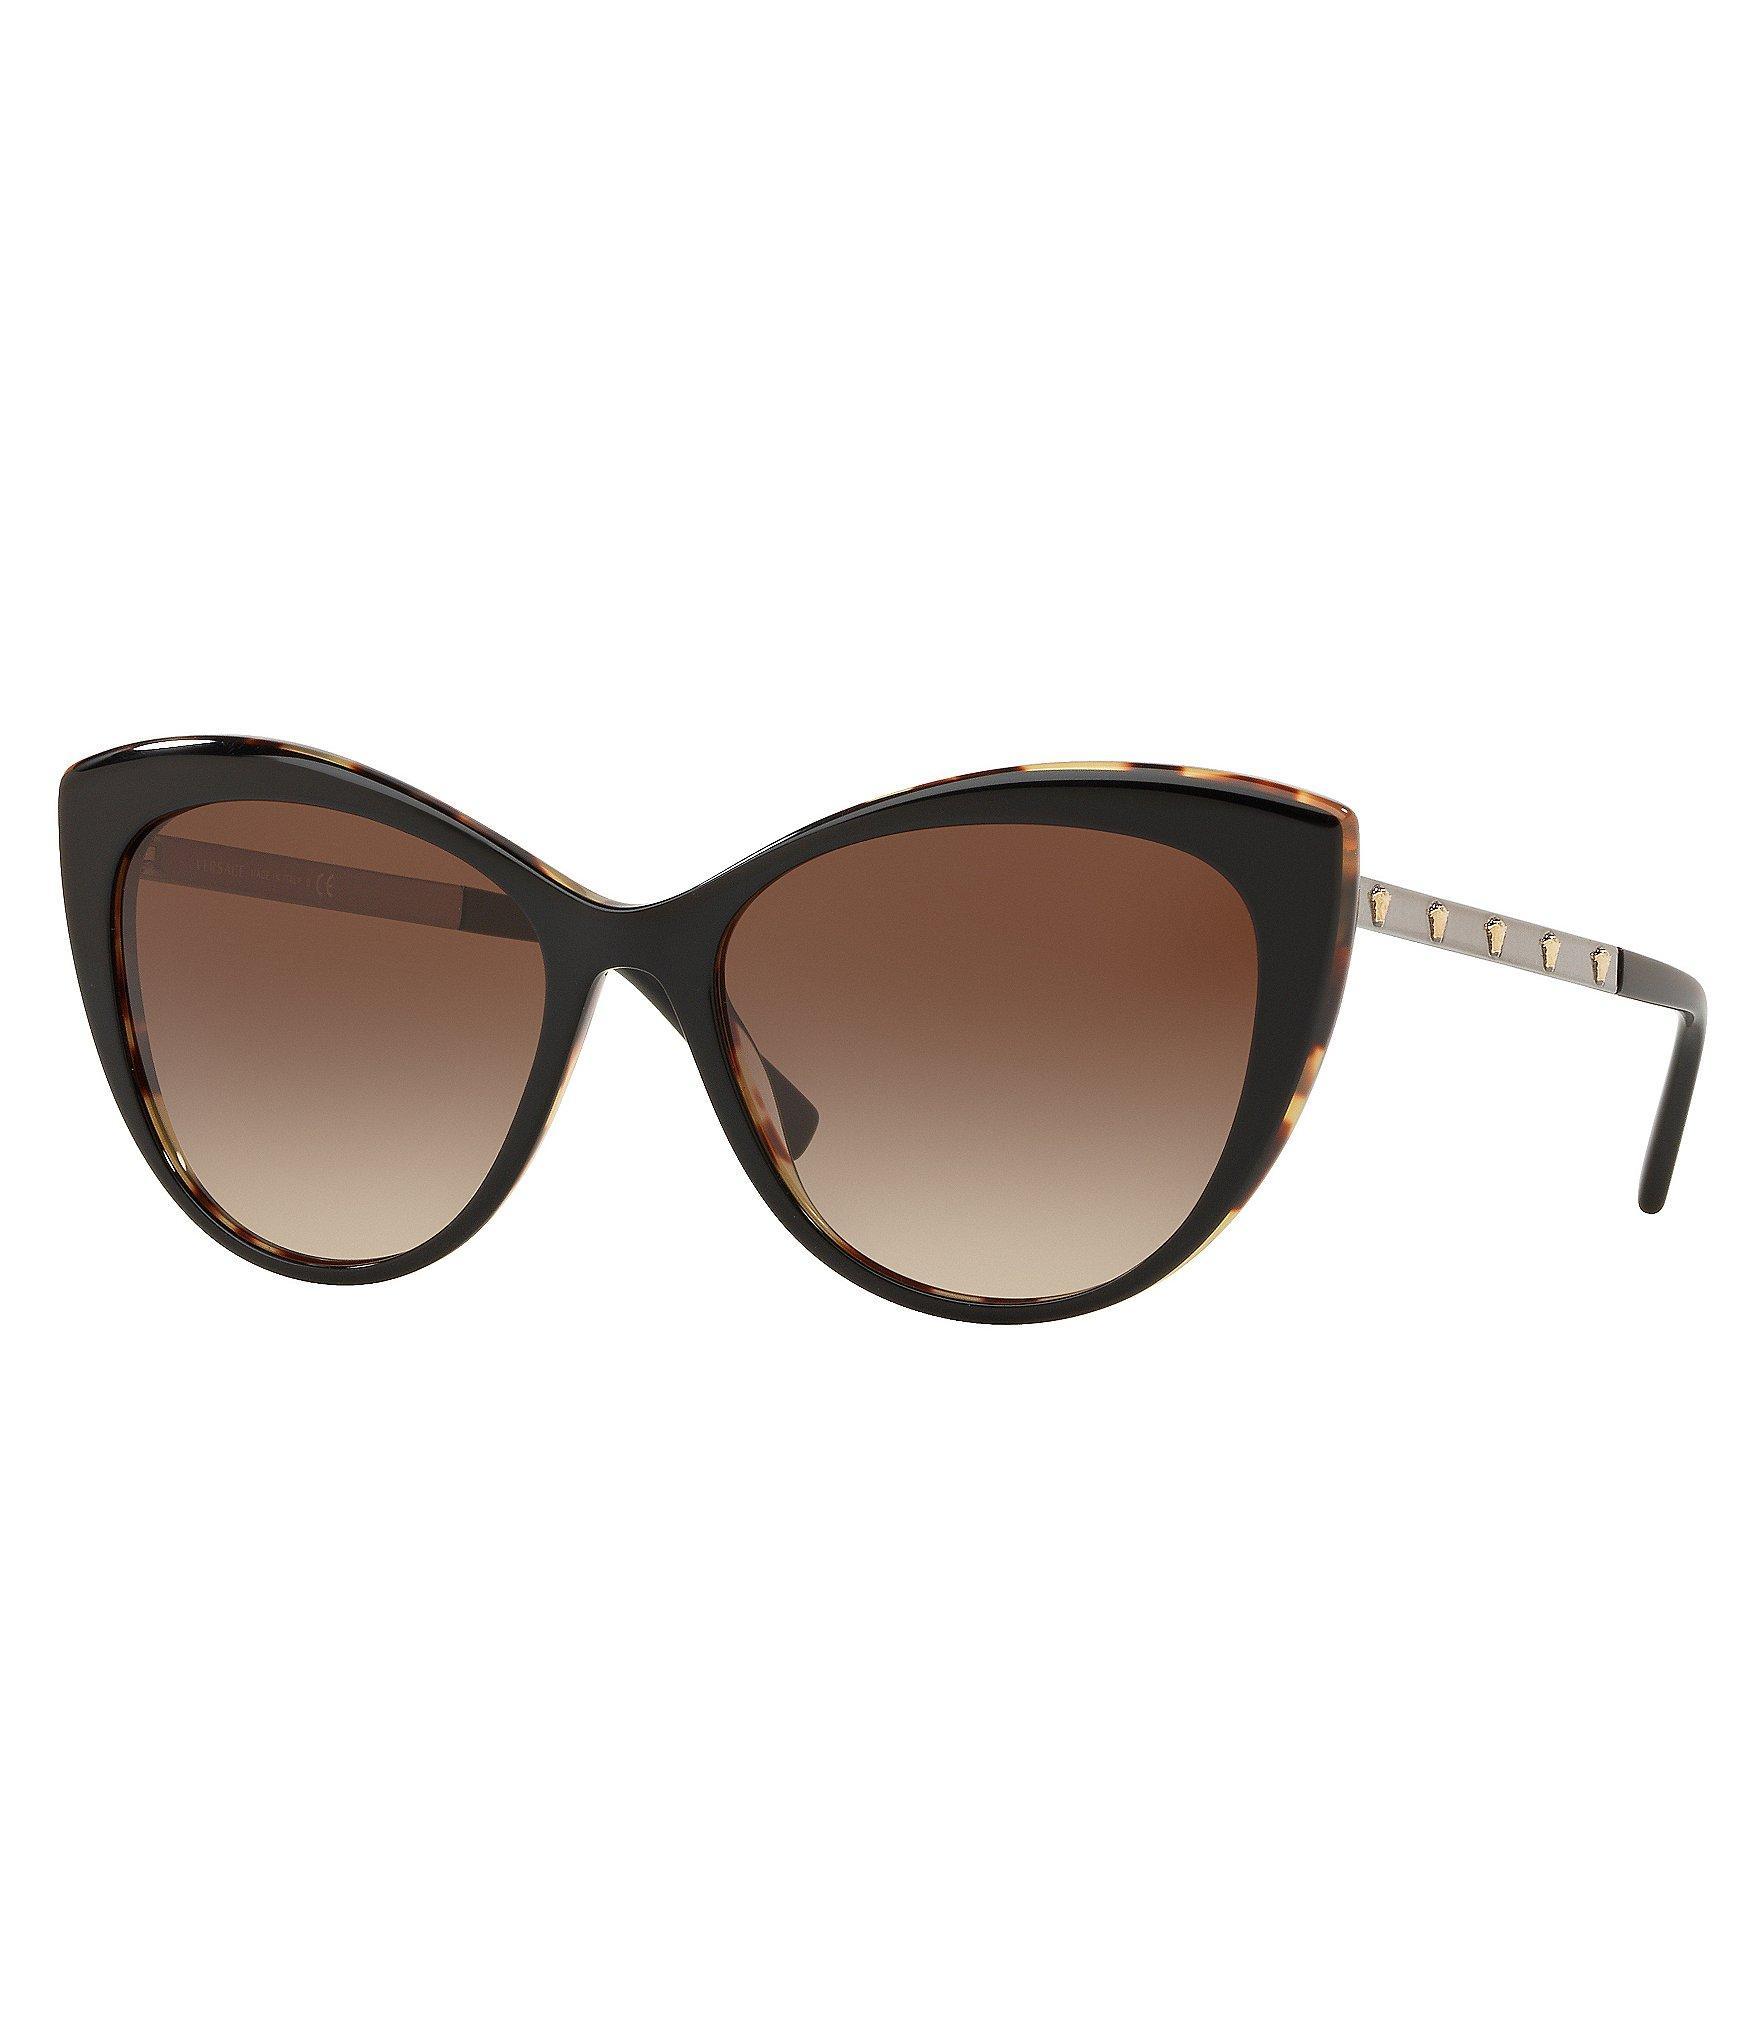 da4026cb8faa Versace. Women s Cateye Medusa Sunglasses